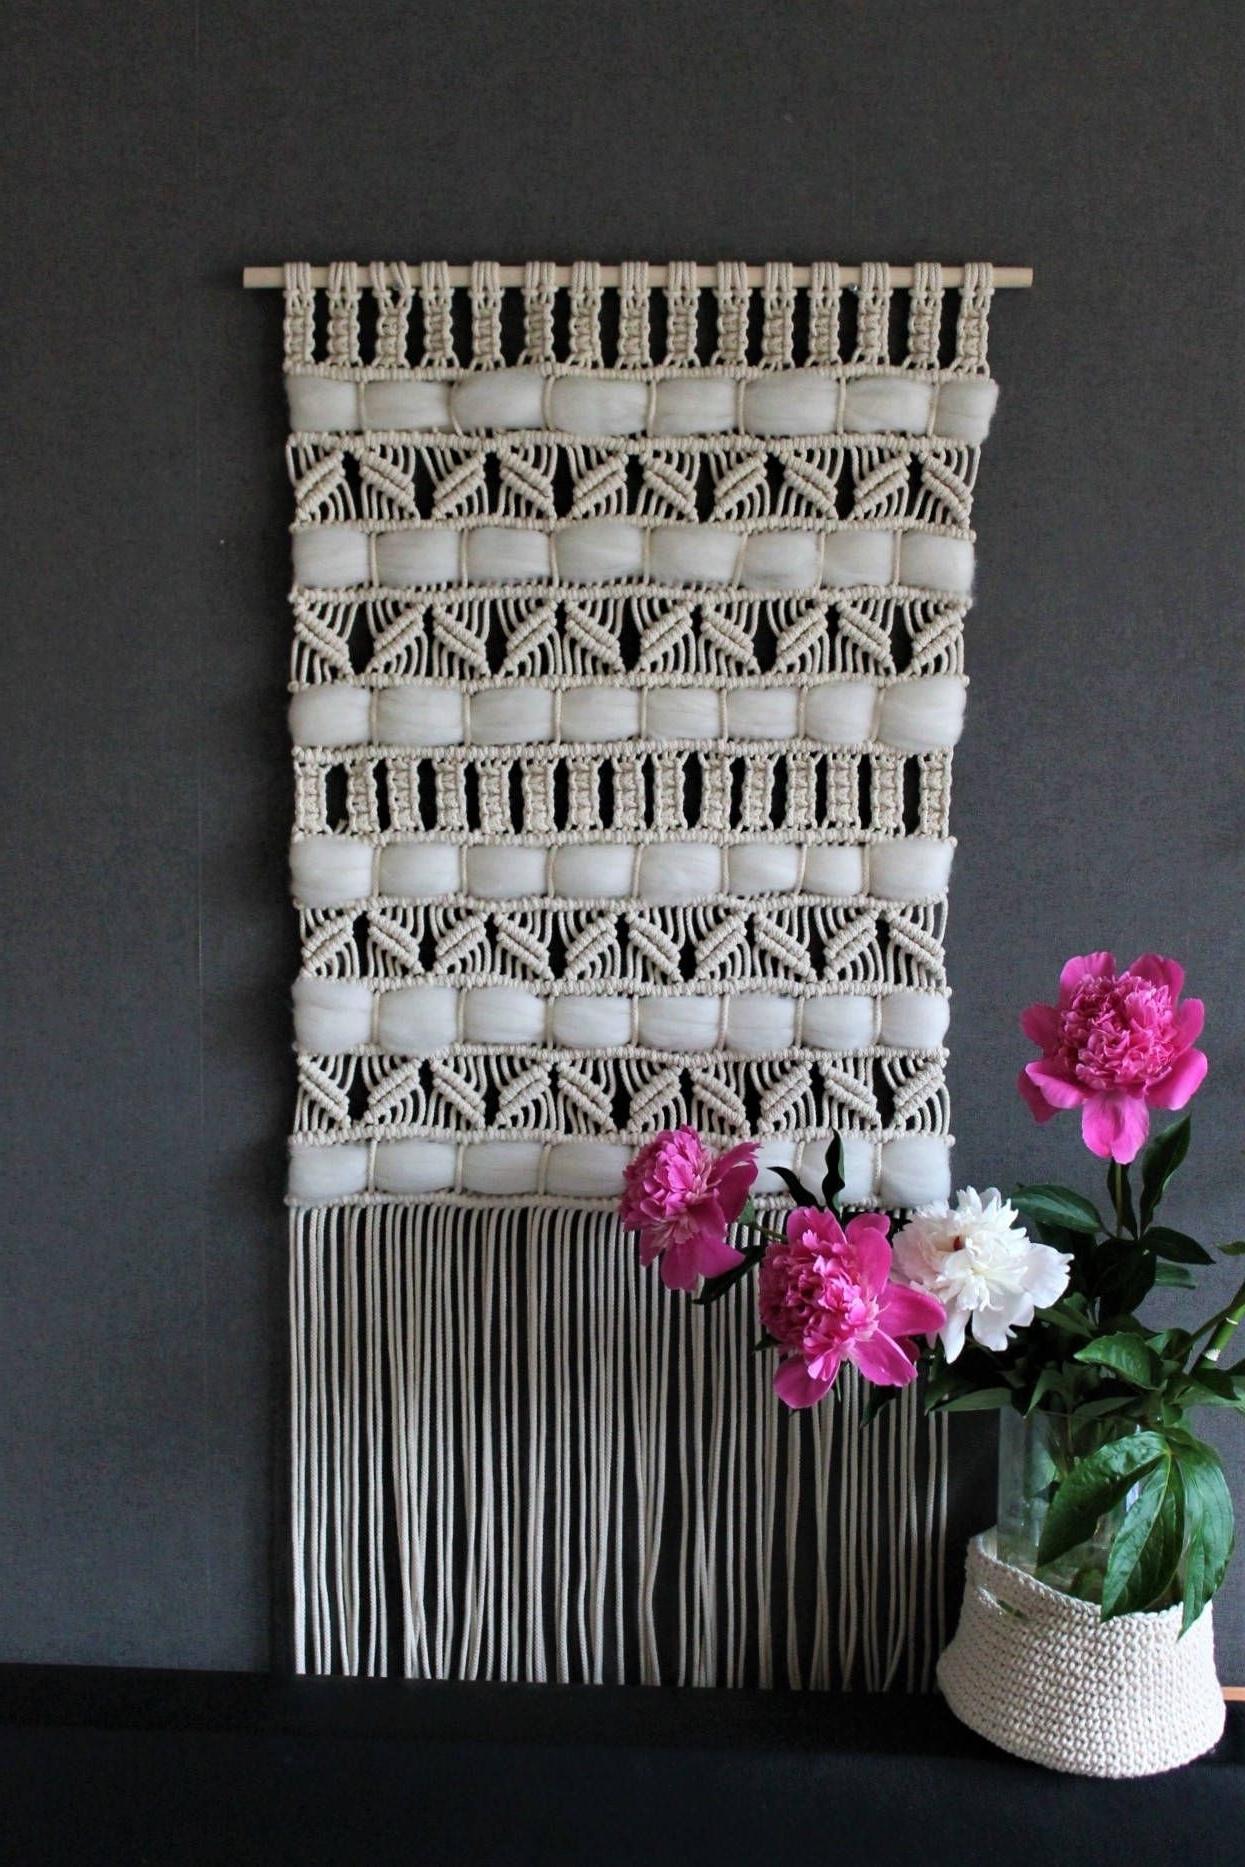 Macrame Wall Hanging On Wooden Dowel Bohemian Macrame Wall Scheme Of For Most Recent Crochet Wall Art (View 14 of 15)